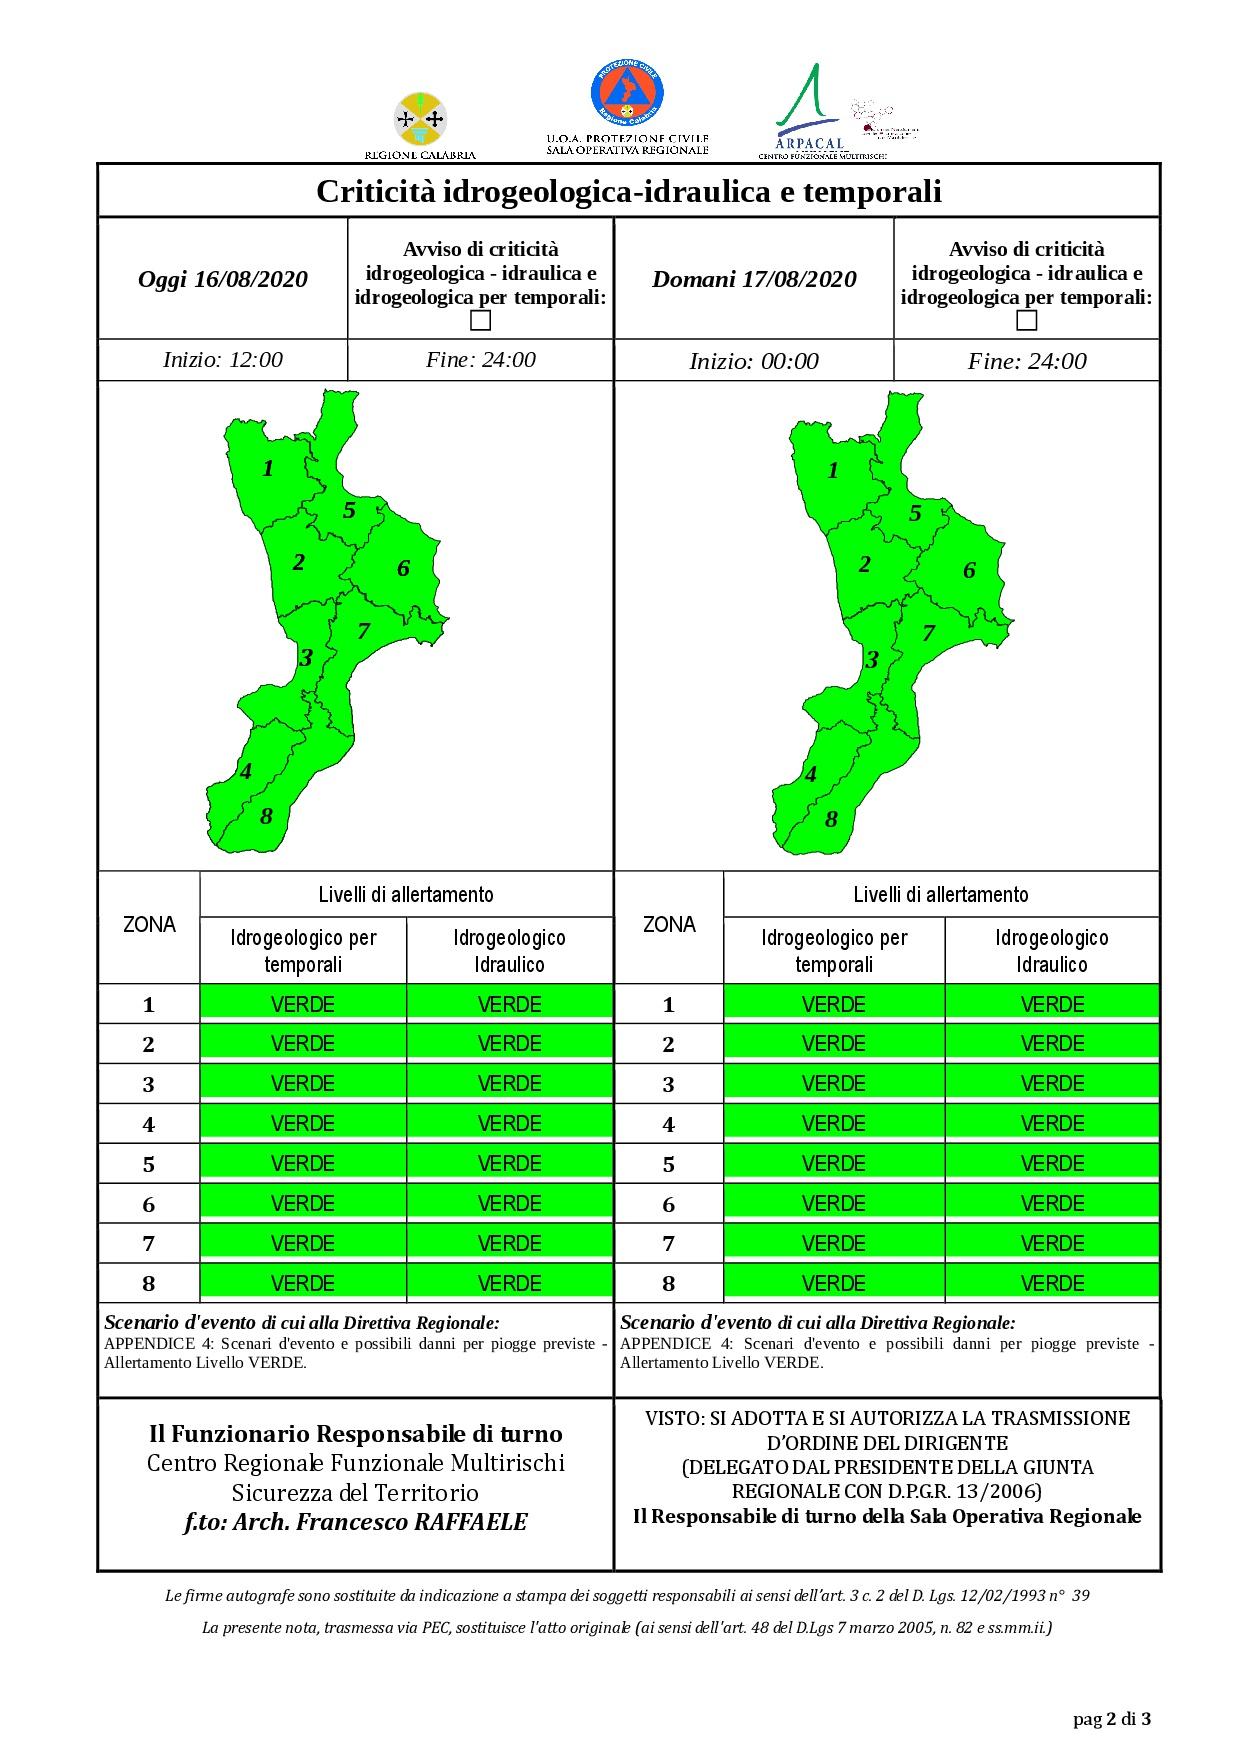 Criticità idrogeologica-idraulica e temporali in Calabria 16-08-2020